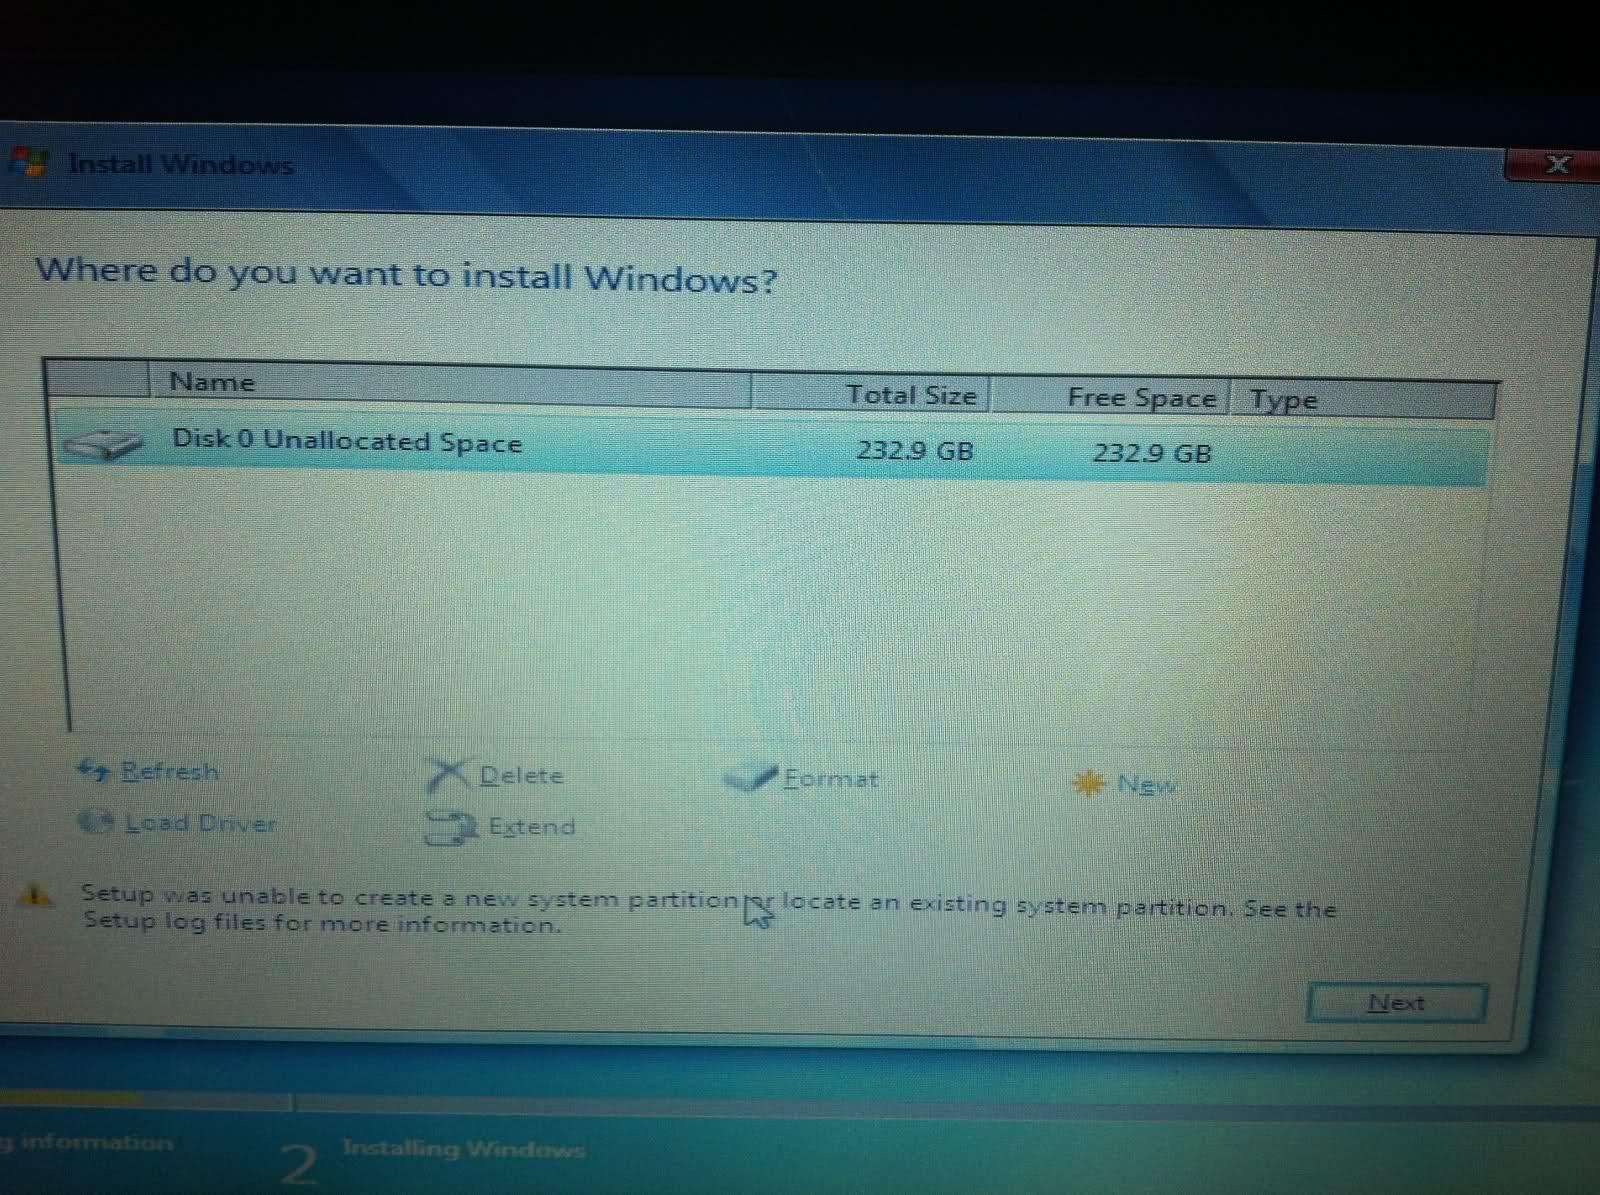 flan 39 s tech blog windows 7 install error using usb key. Black Bedroom Furniture Sets. Home Design Ideas